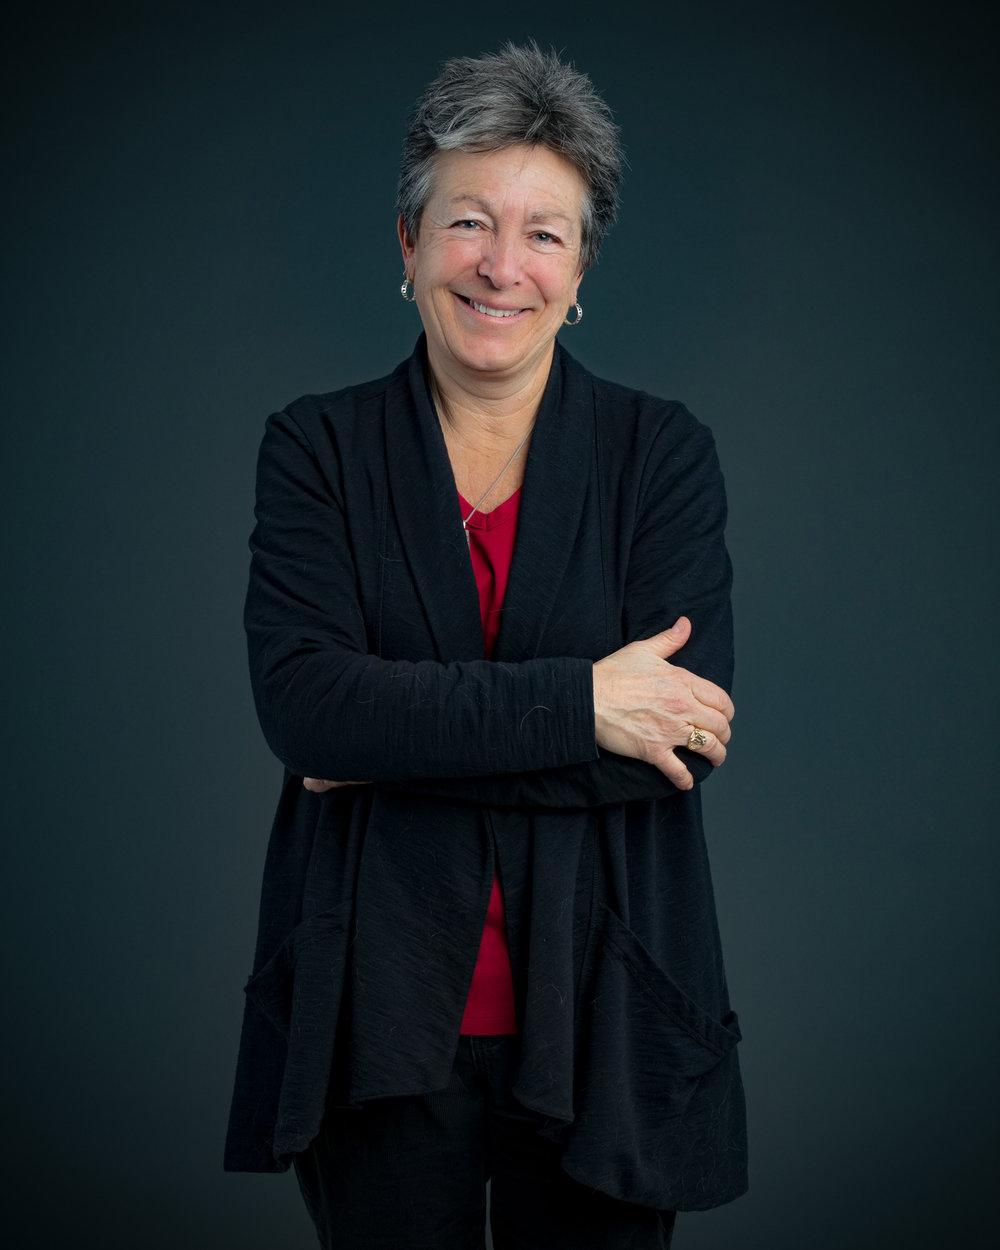 Lori Richman, Director of Organization Development, Quality Bicycle Parts